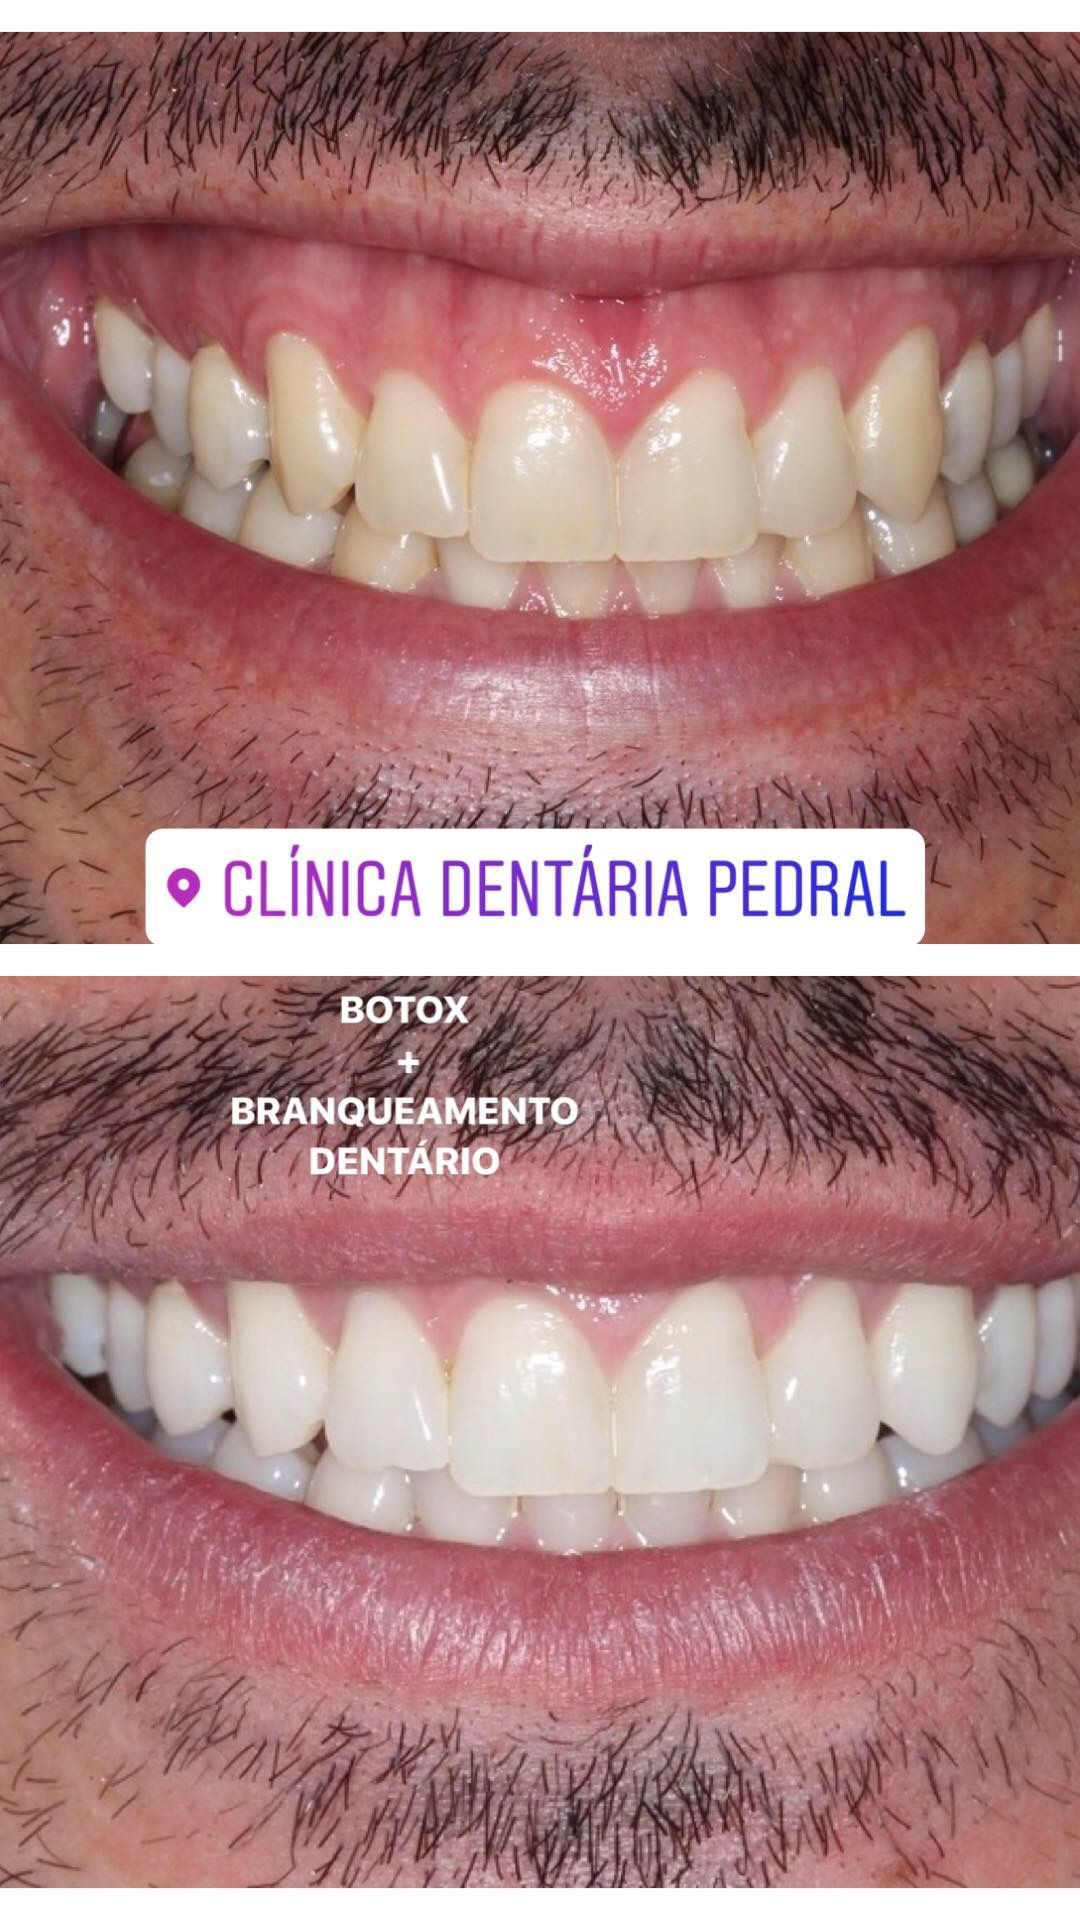 Tratamento Multidisciplinar Branqueamento Dentario Em Consultorio